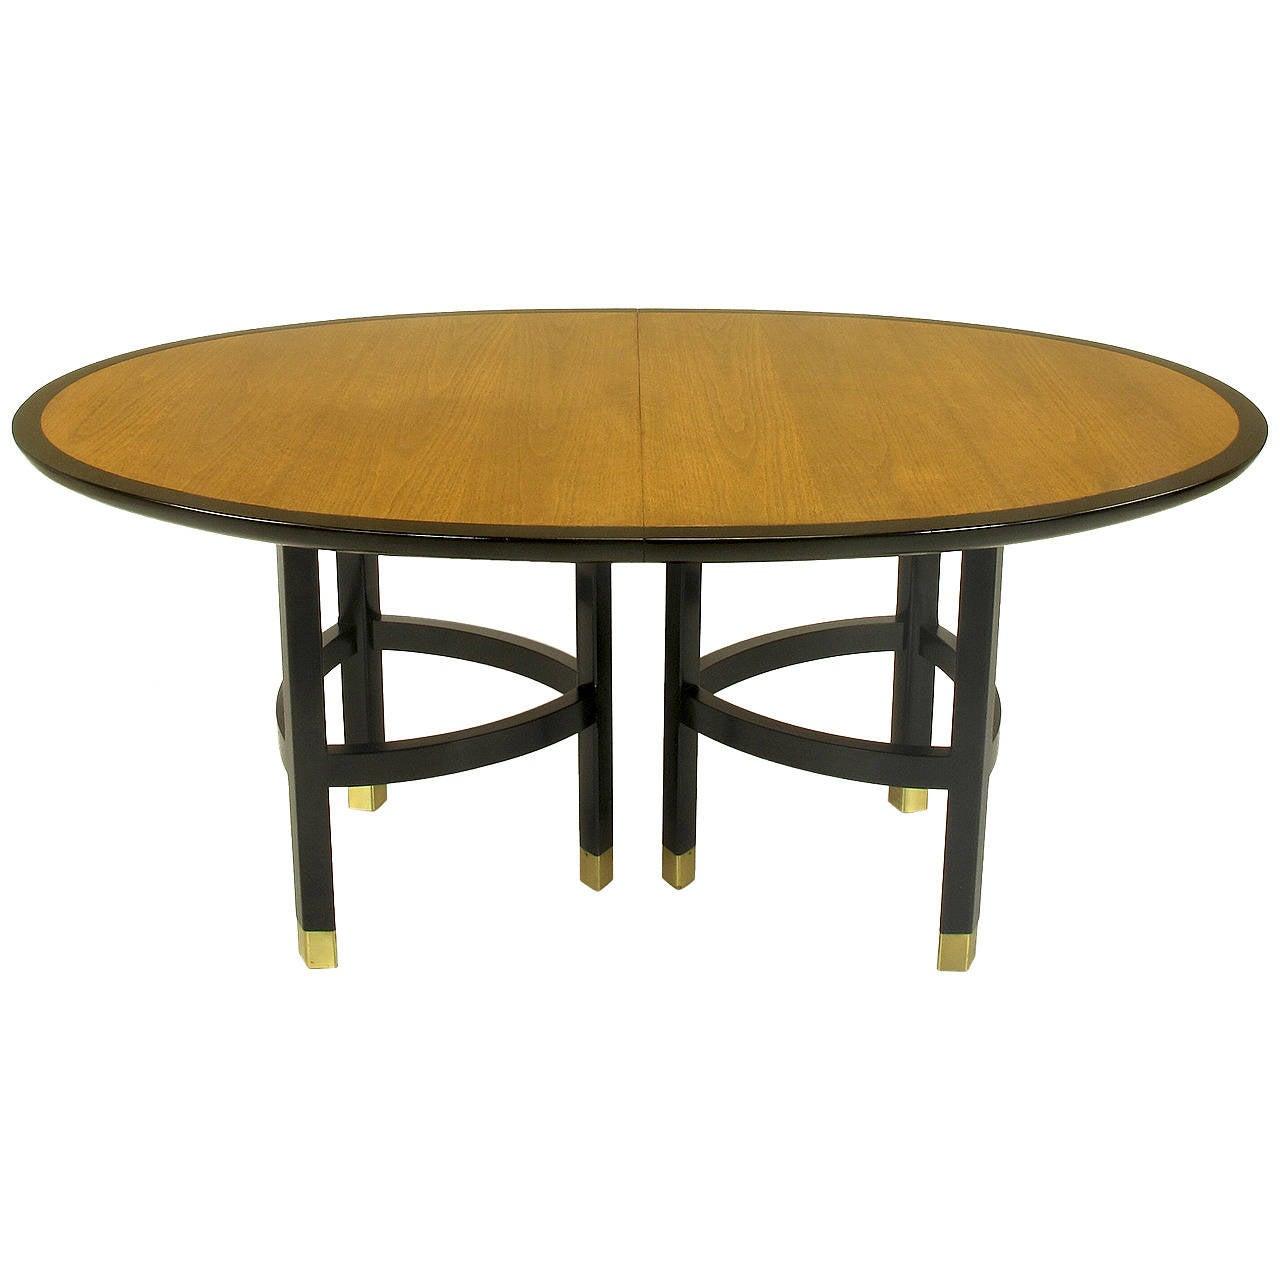 Michael taylor cyprus tree trunk dining table at 1stdibs - Baker Walnut And Ebonized Mahogany Dining Table 1